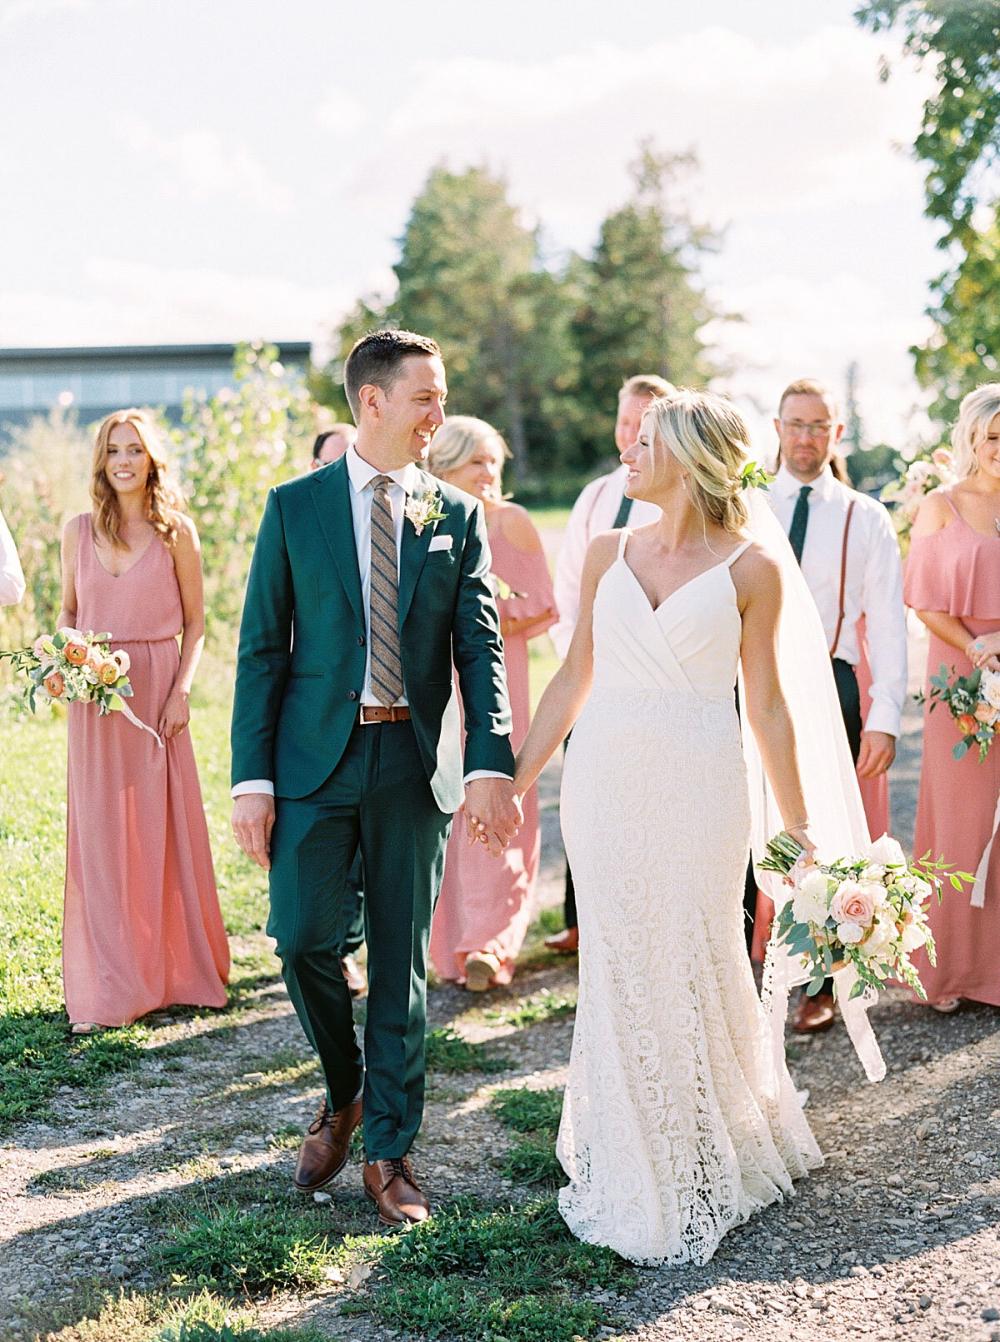 Ravine Vineyard Wedding Photography By Caileigh Langford Vineyard Bride Southern Ontario S Wedding Resource Vineyard Wedding Wedding Wedding Photography [ 1342 x 1000 Pixel ]